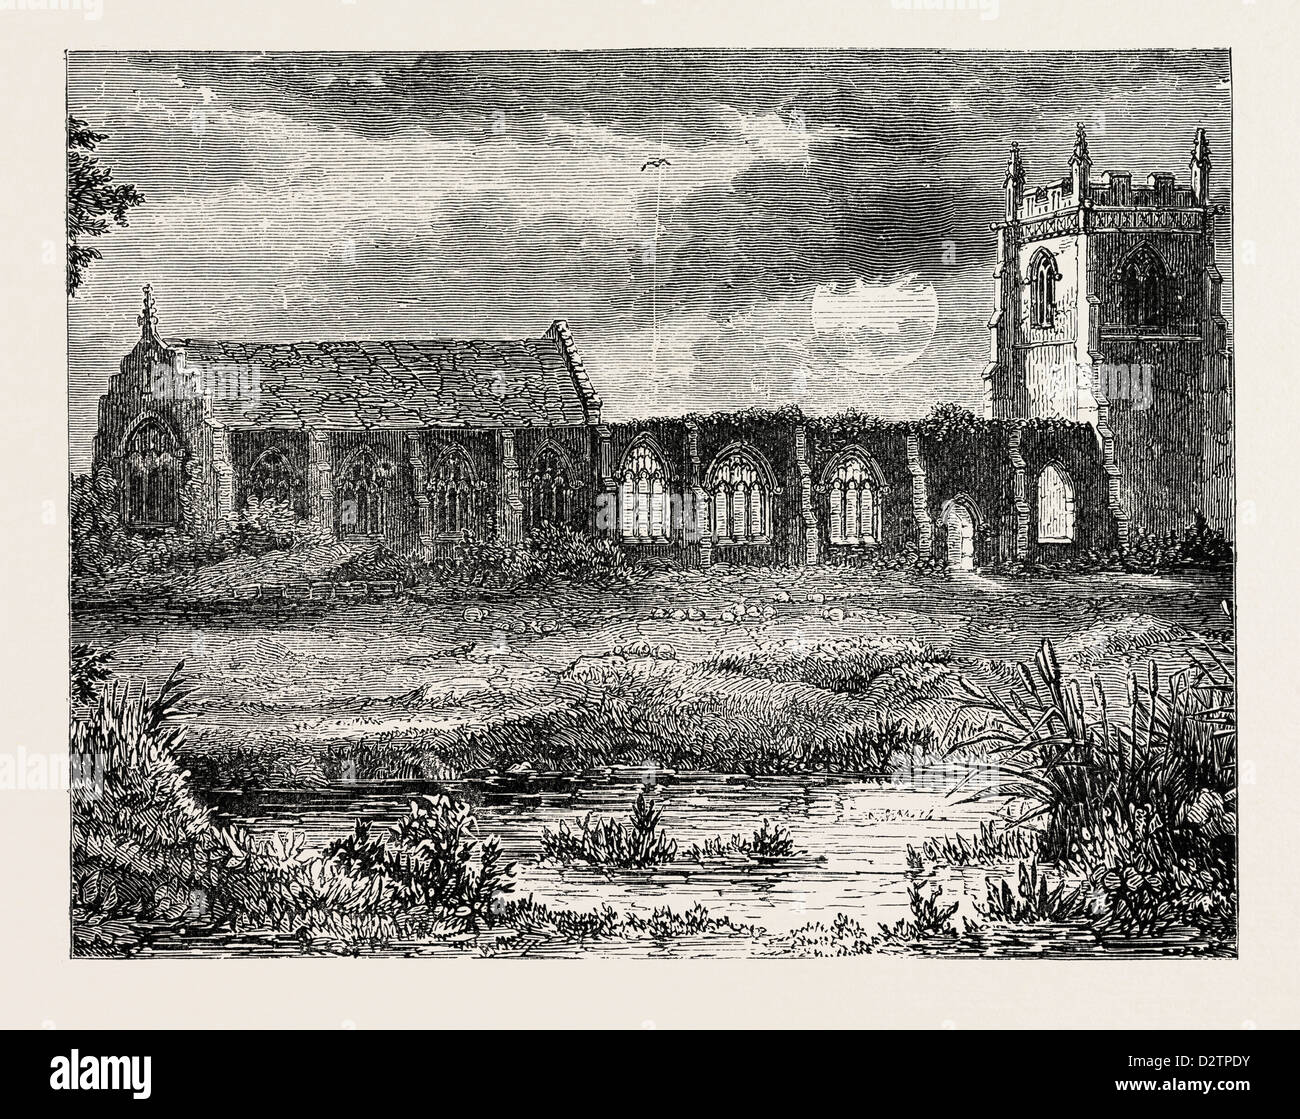 CHURCH OF THE BATTLEFIELD SHREWSBURY. - Stock Image